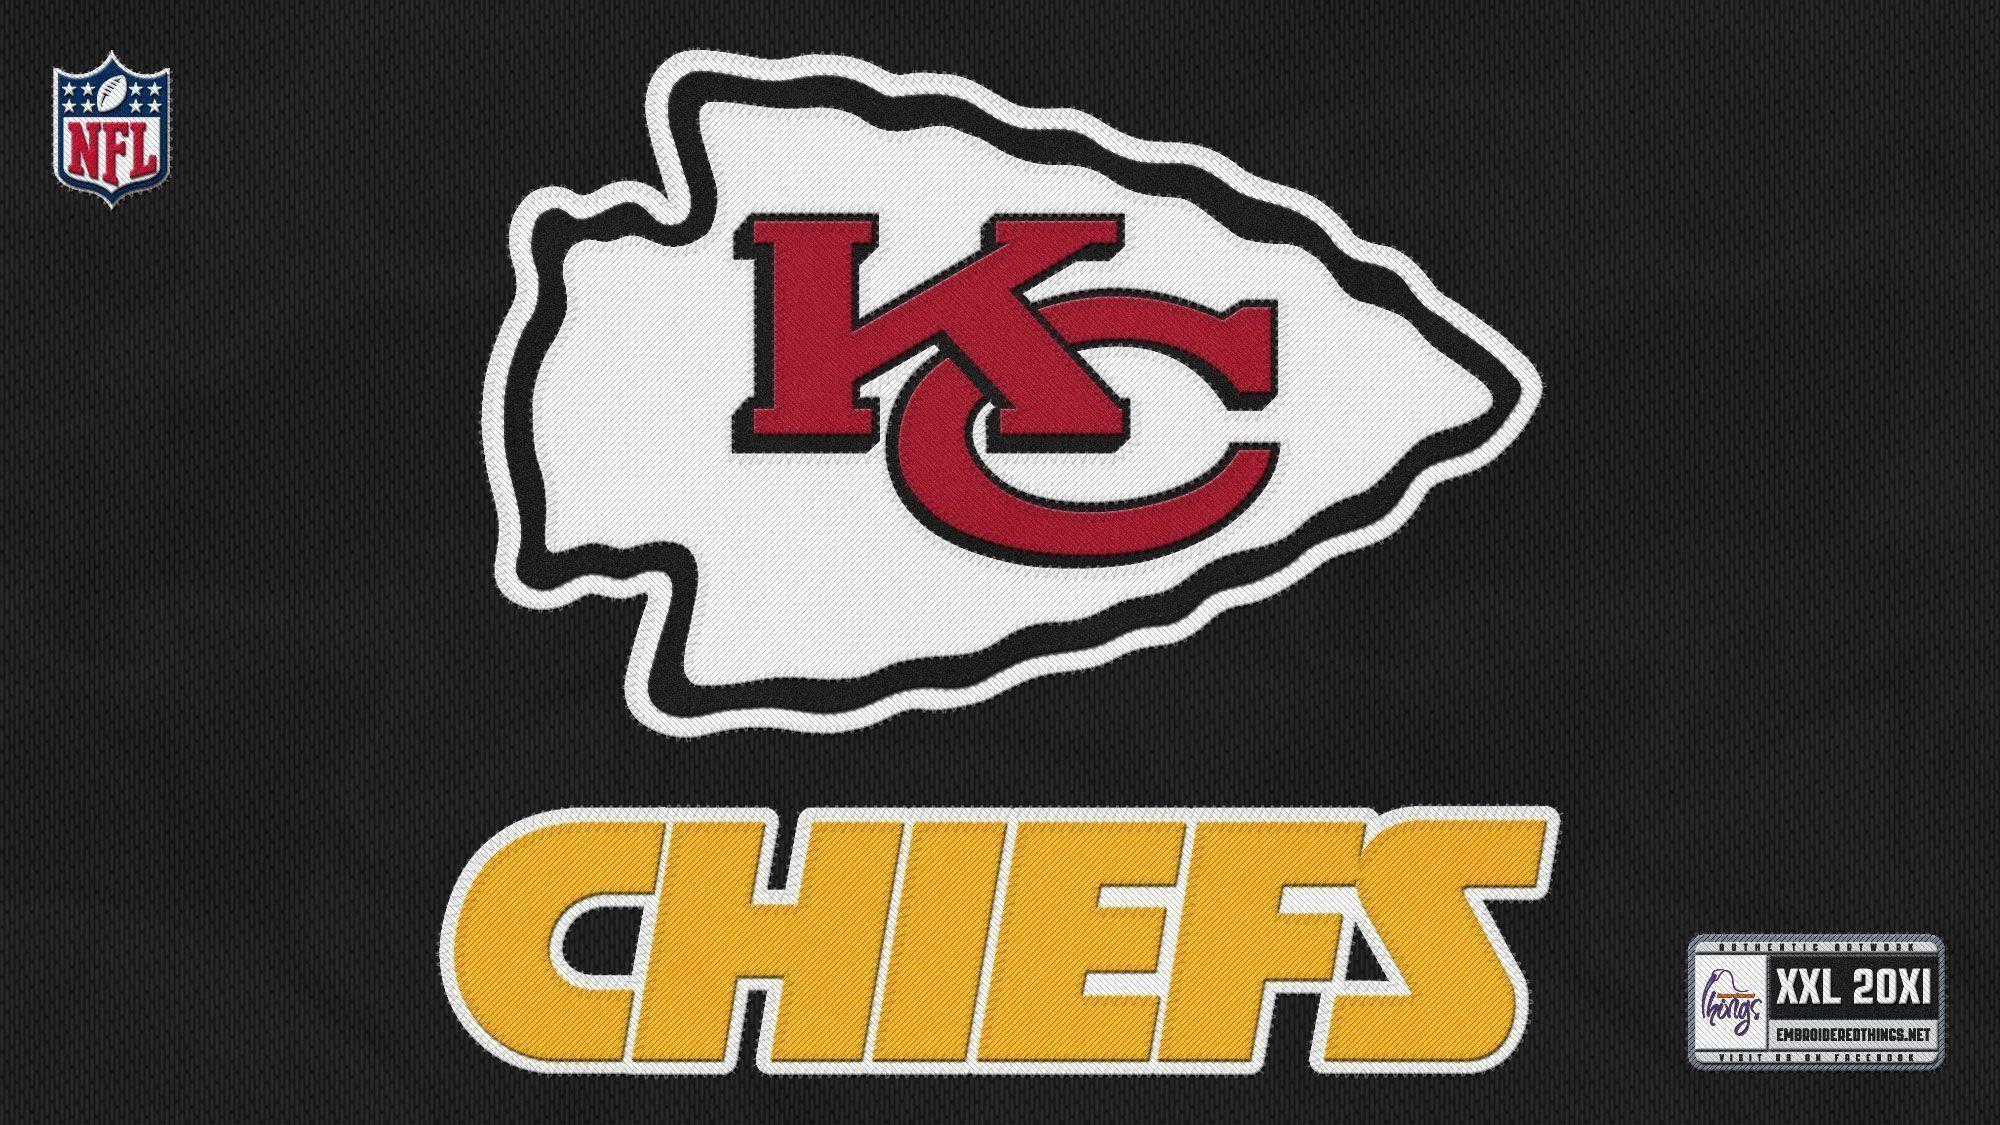 Kansas-city-chiefs-wallpapers-5 25227 HD Wallpapers | Opengavel.com